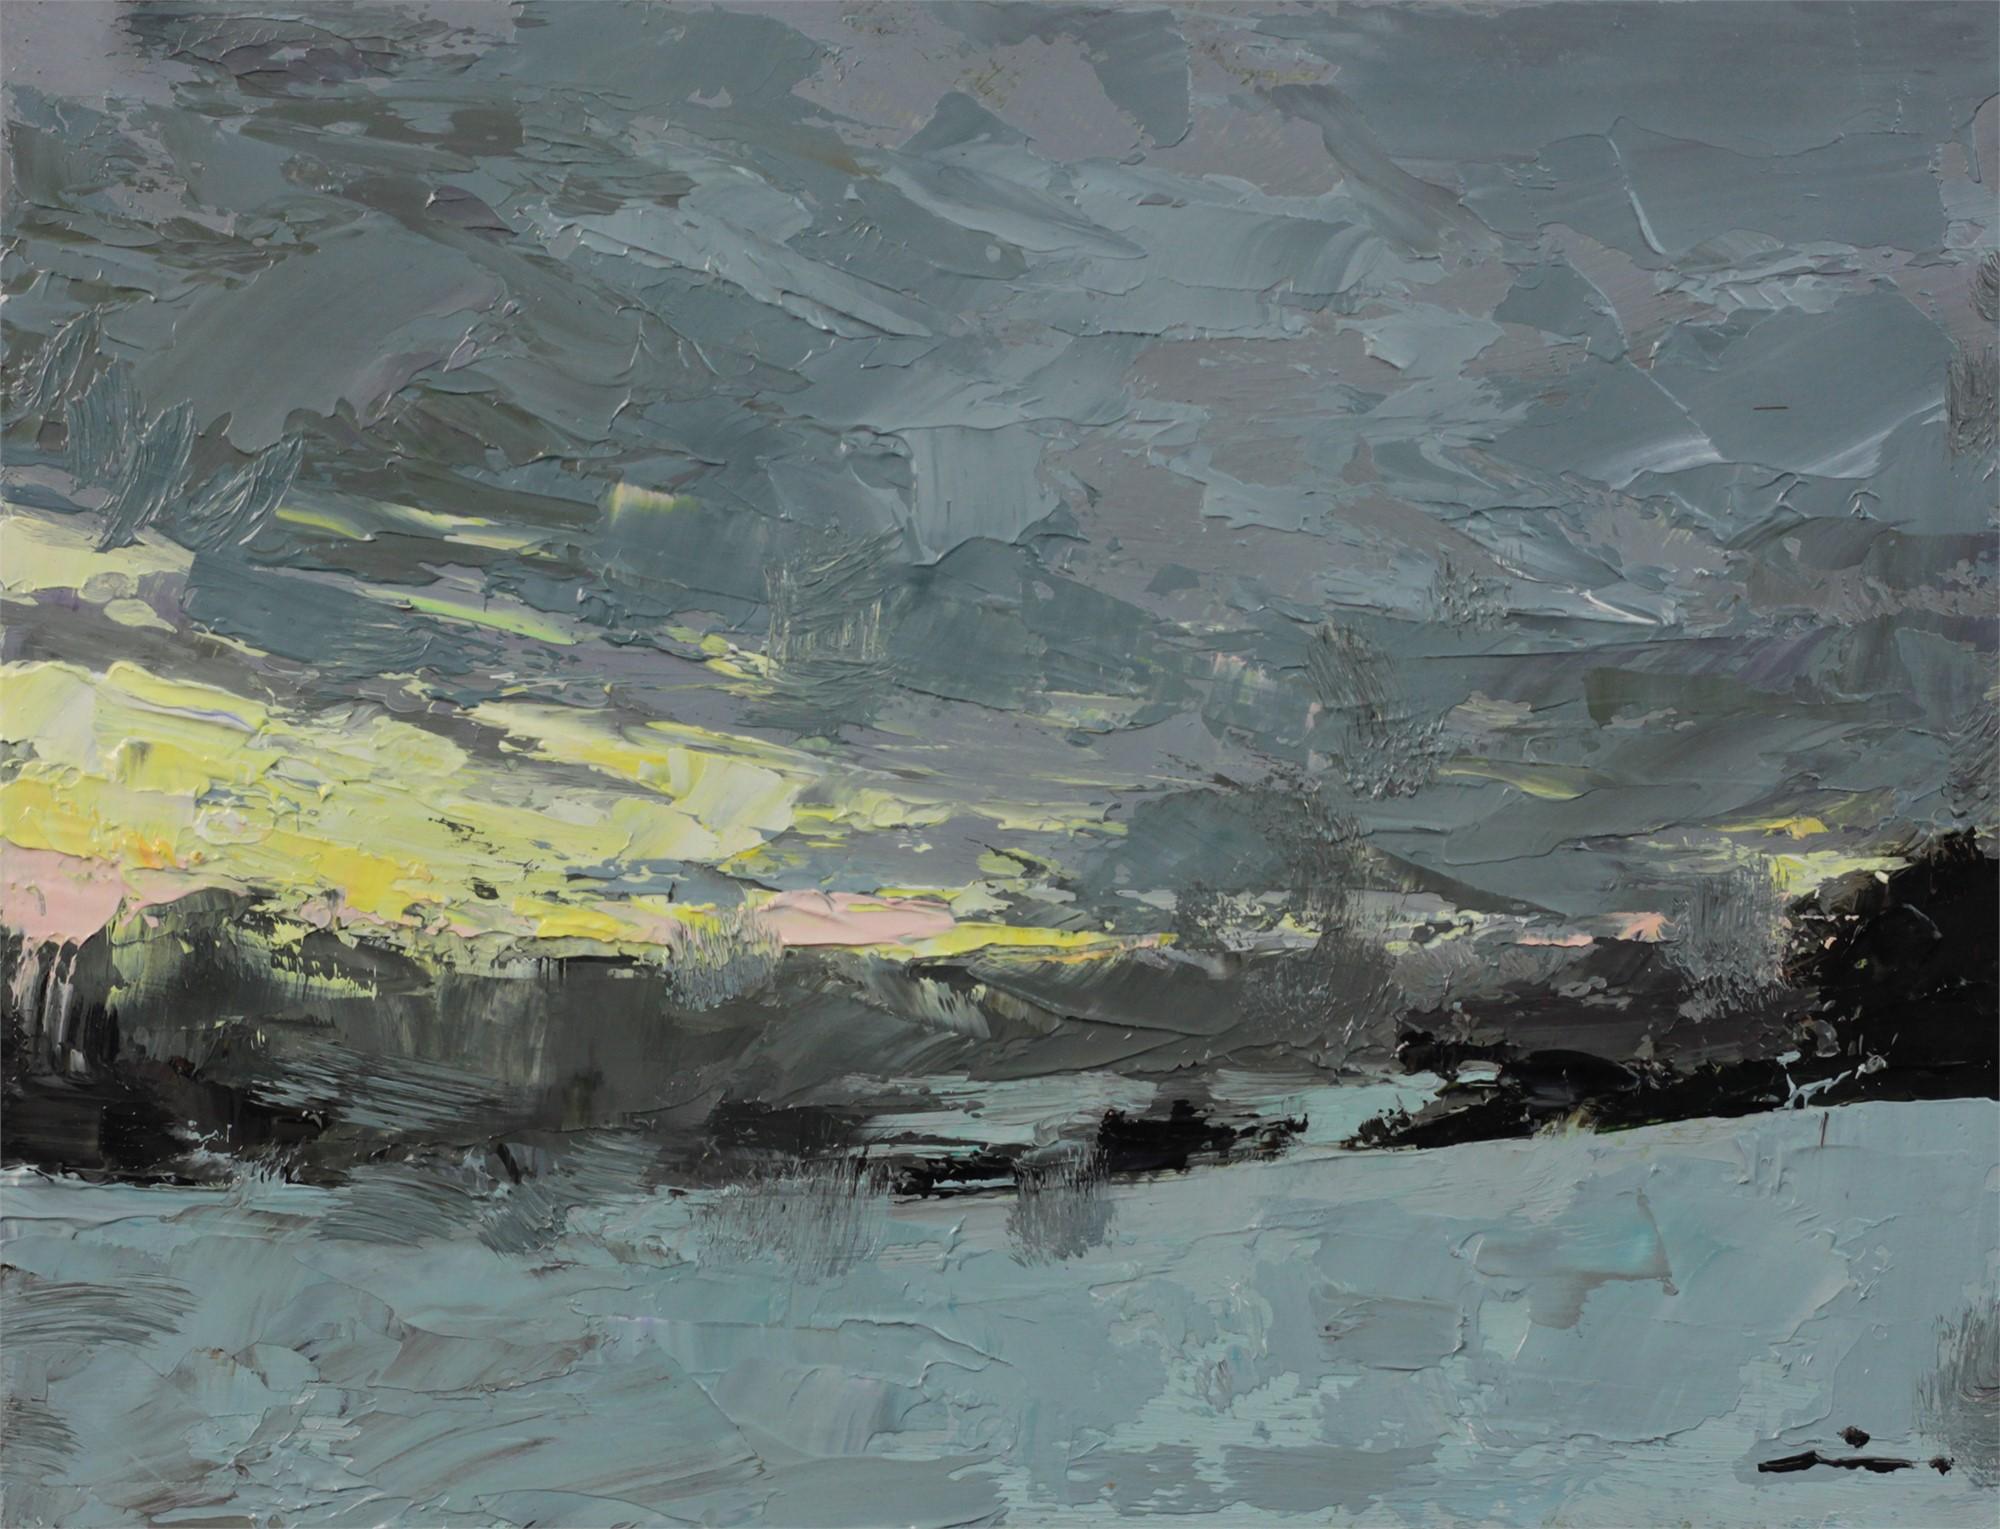 The Thaw by Mia Bergeron